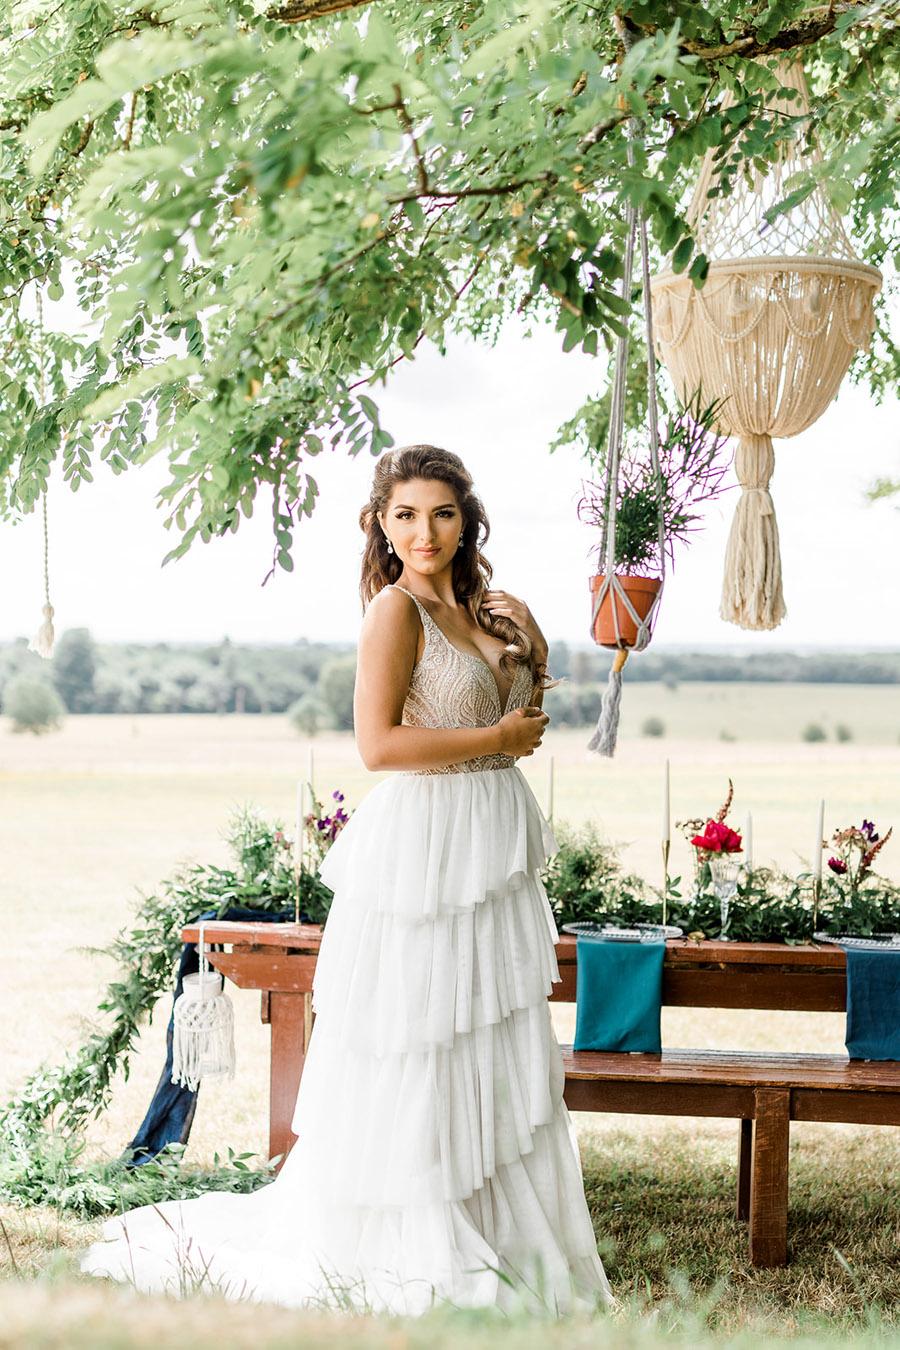 Modern Boho wedding style inspiration from Slindon House, photographer credit Kelsie Scully Photography (12)